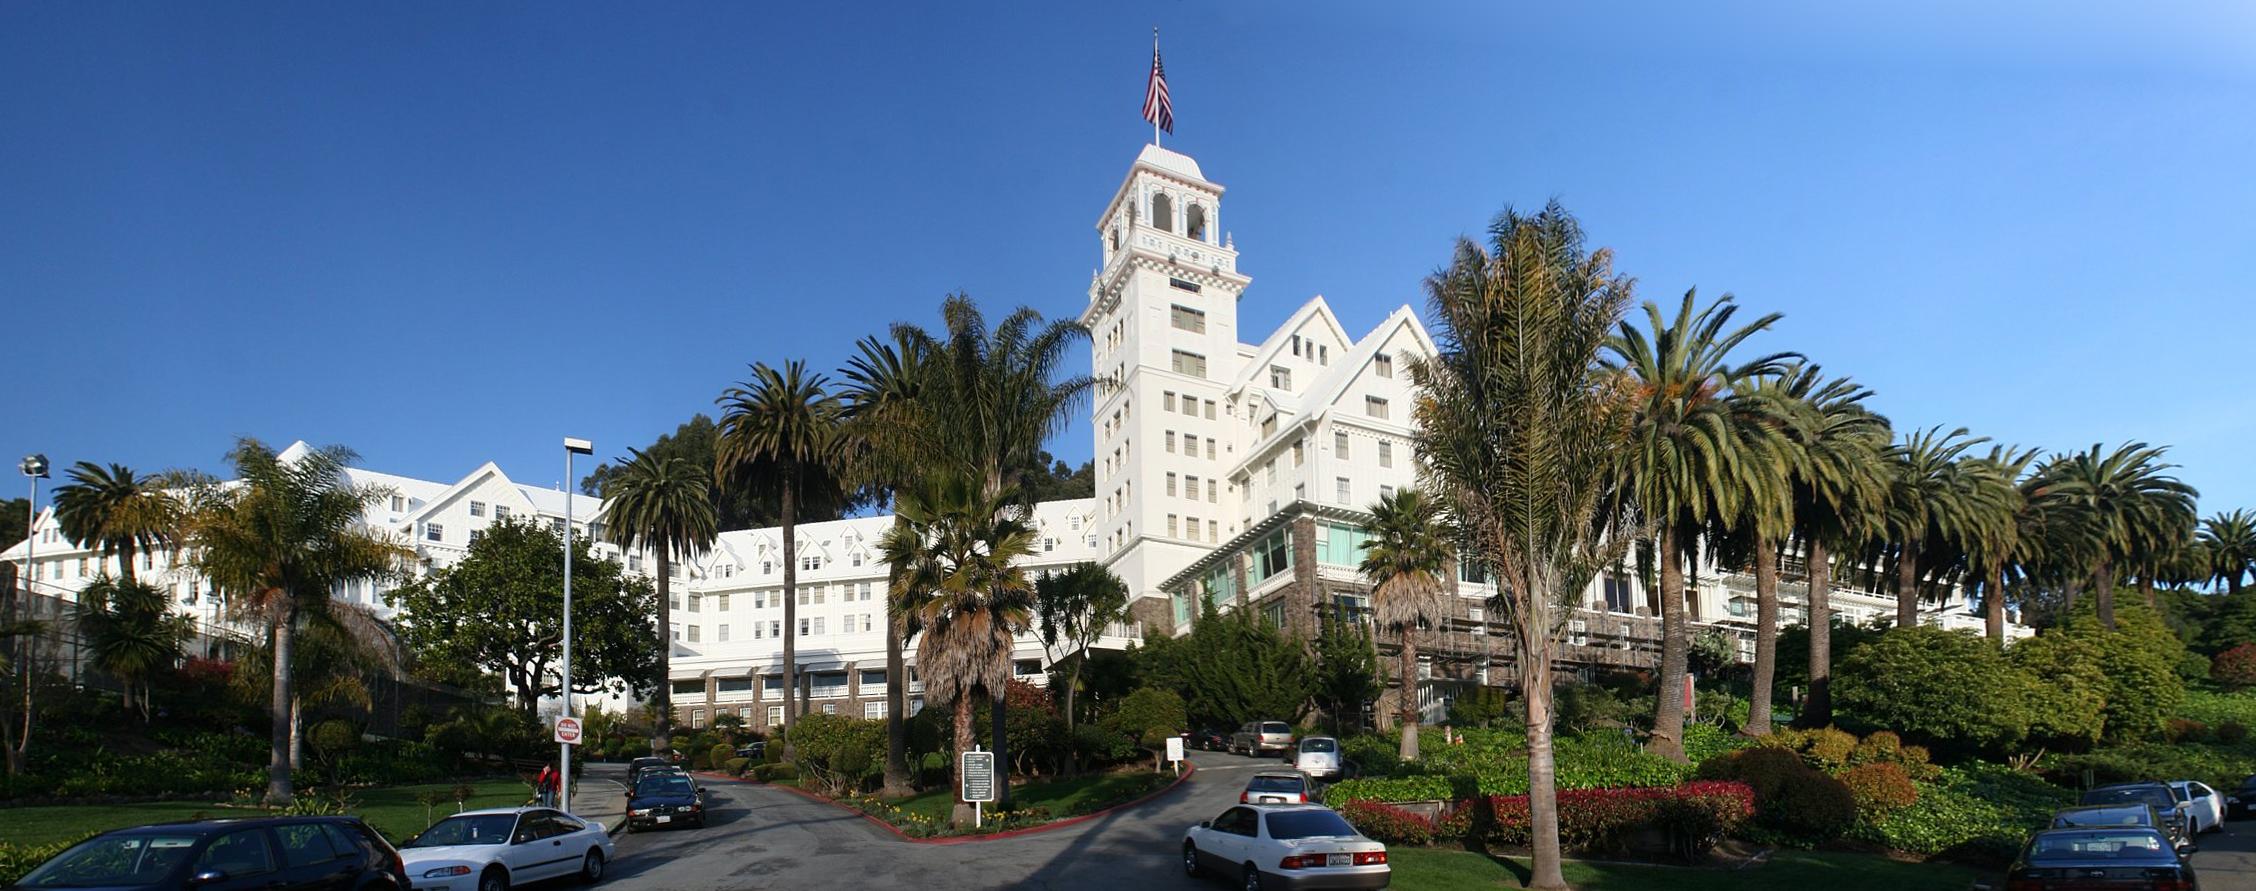 Claremont Hotel Spa Wikipedia